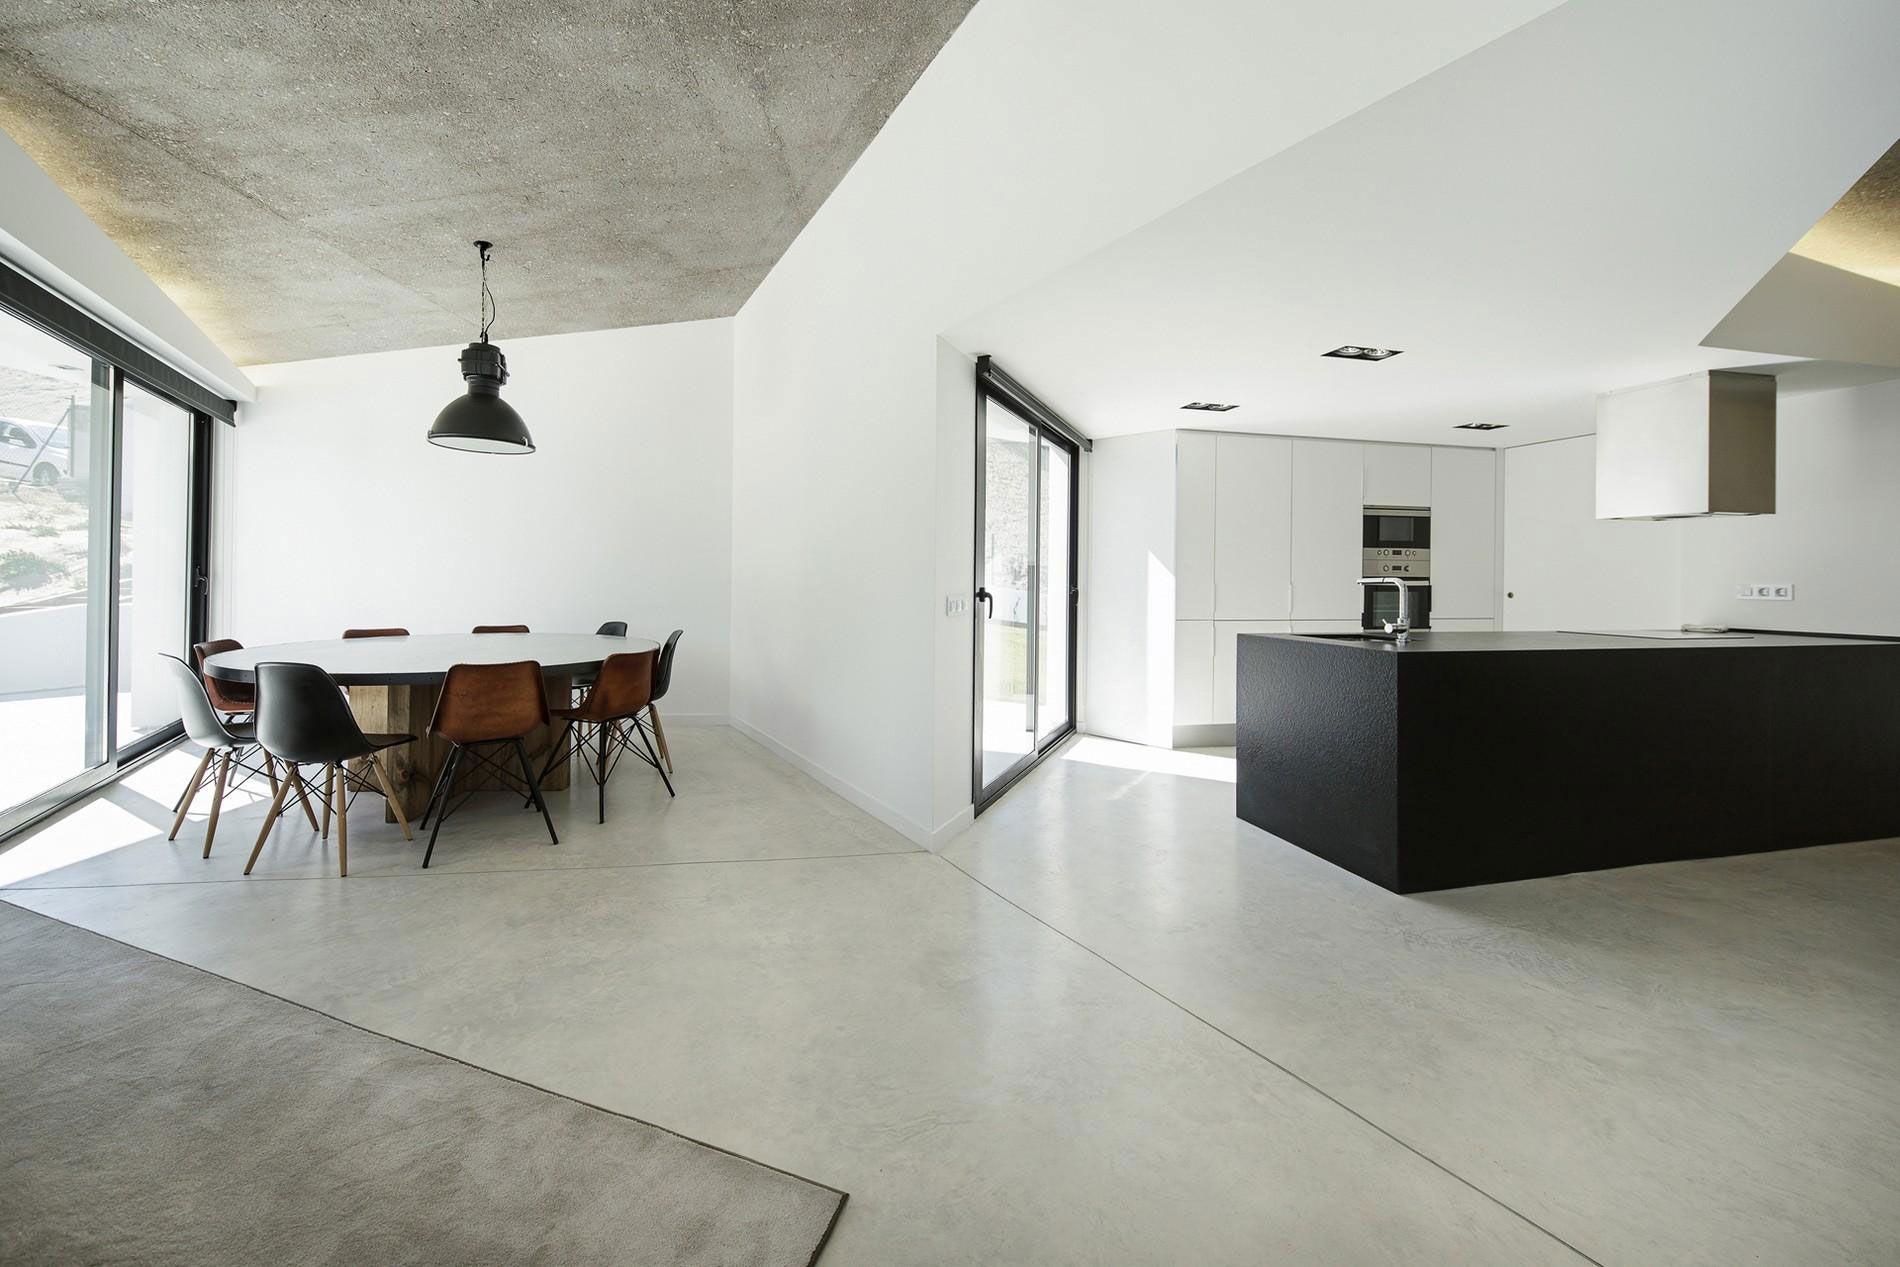 House-JC-06